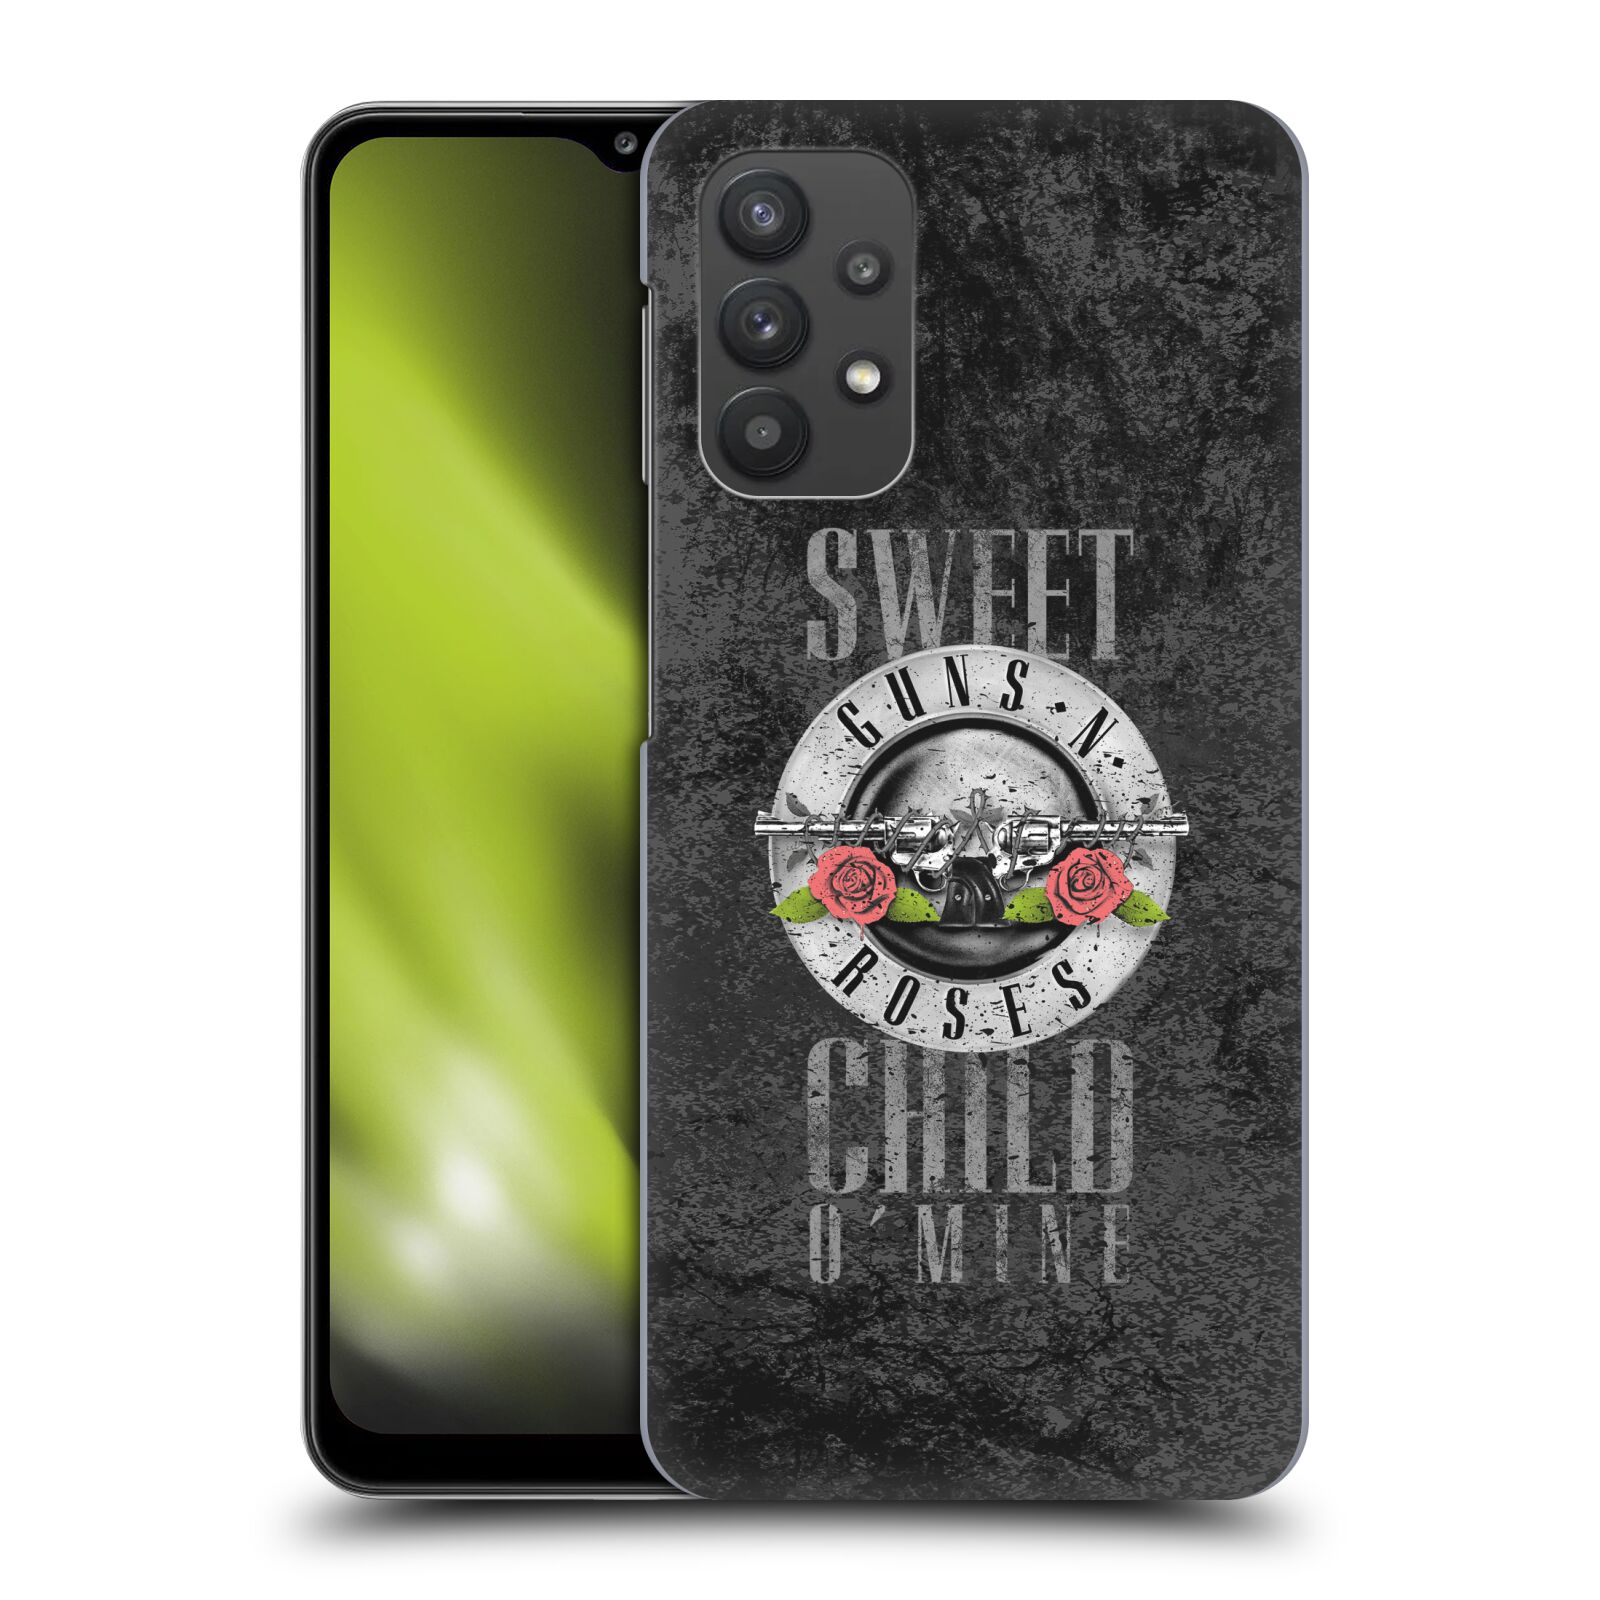 Plastové pouzdro na mobil Samsung Galaxy A32 5G - Head Case - Guns N' Roses - Sweet Child